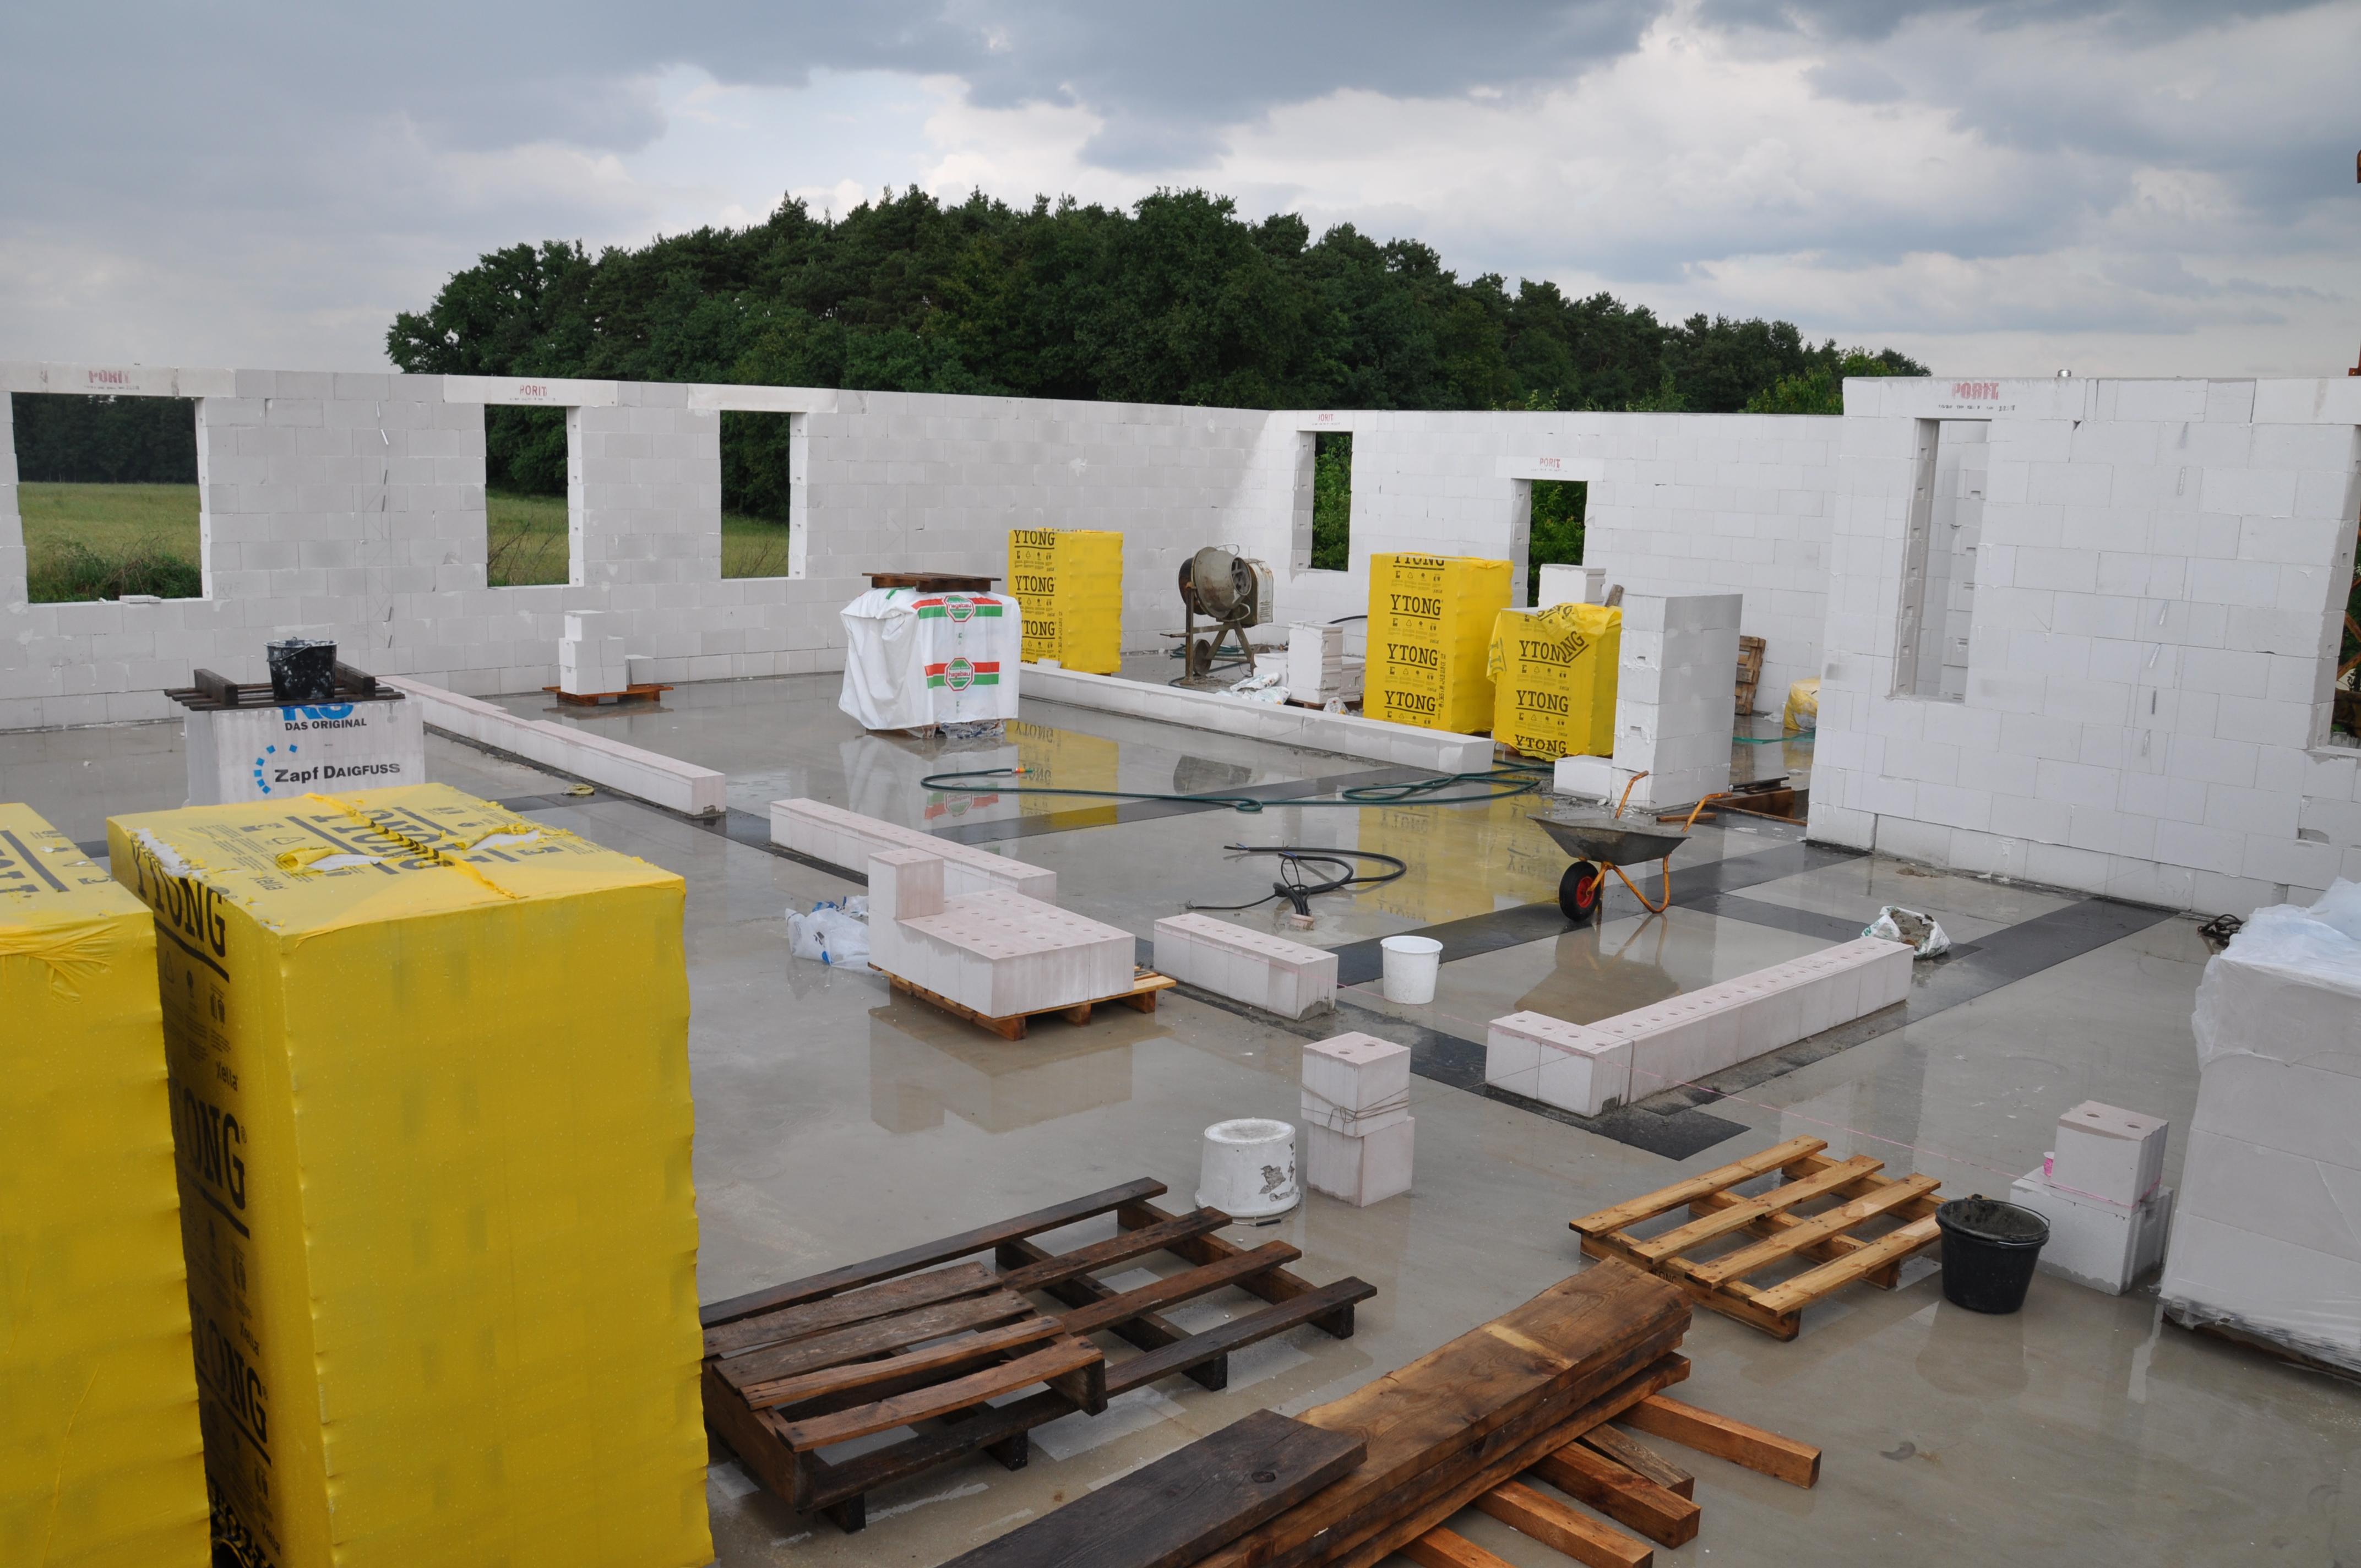 7 juni 2011 haus im selbstbau. Black Bedroom Furniture Sets. Home Design Ideas